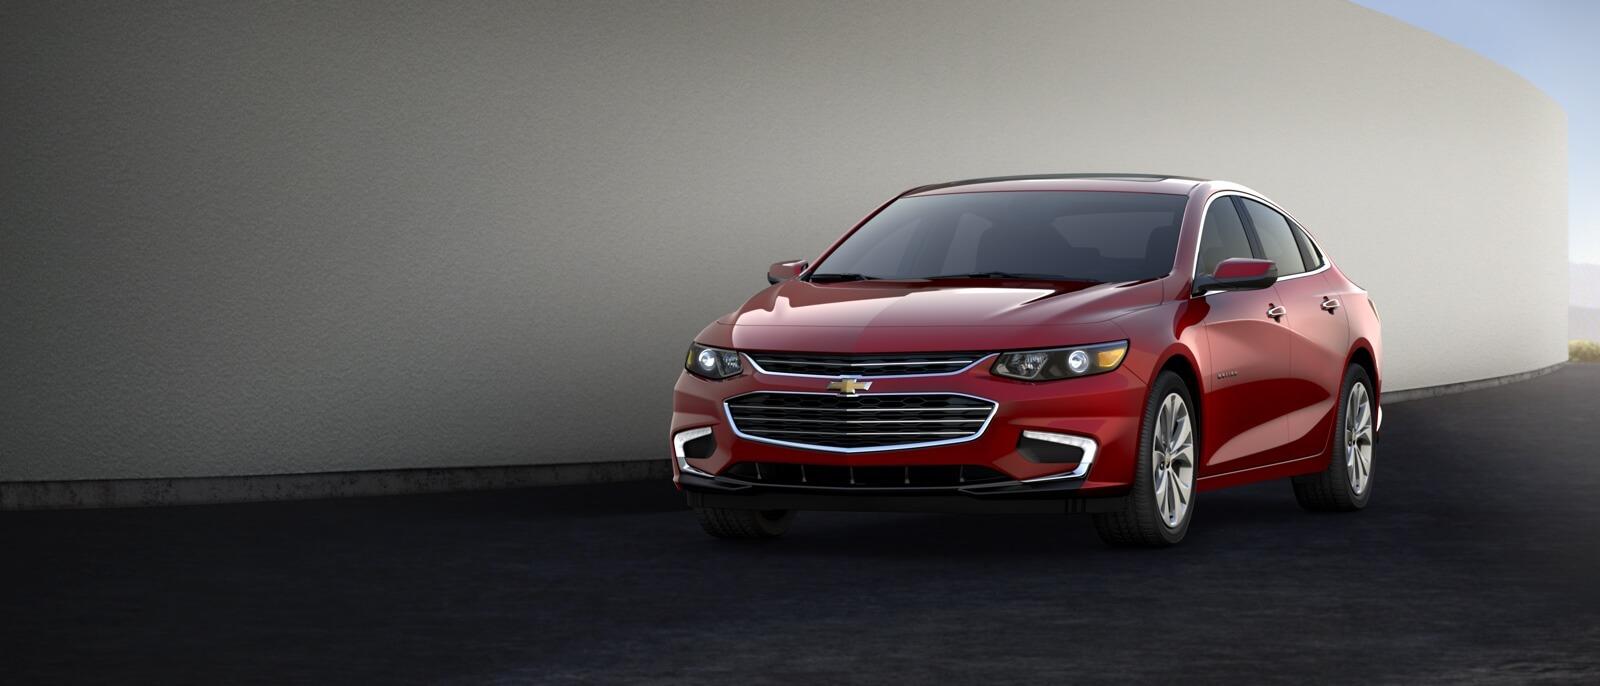 2017 Chevrolet Malibu red exterior model